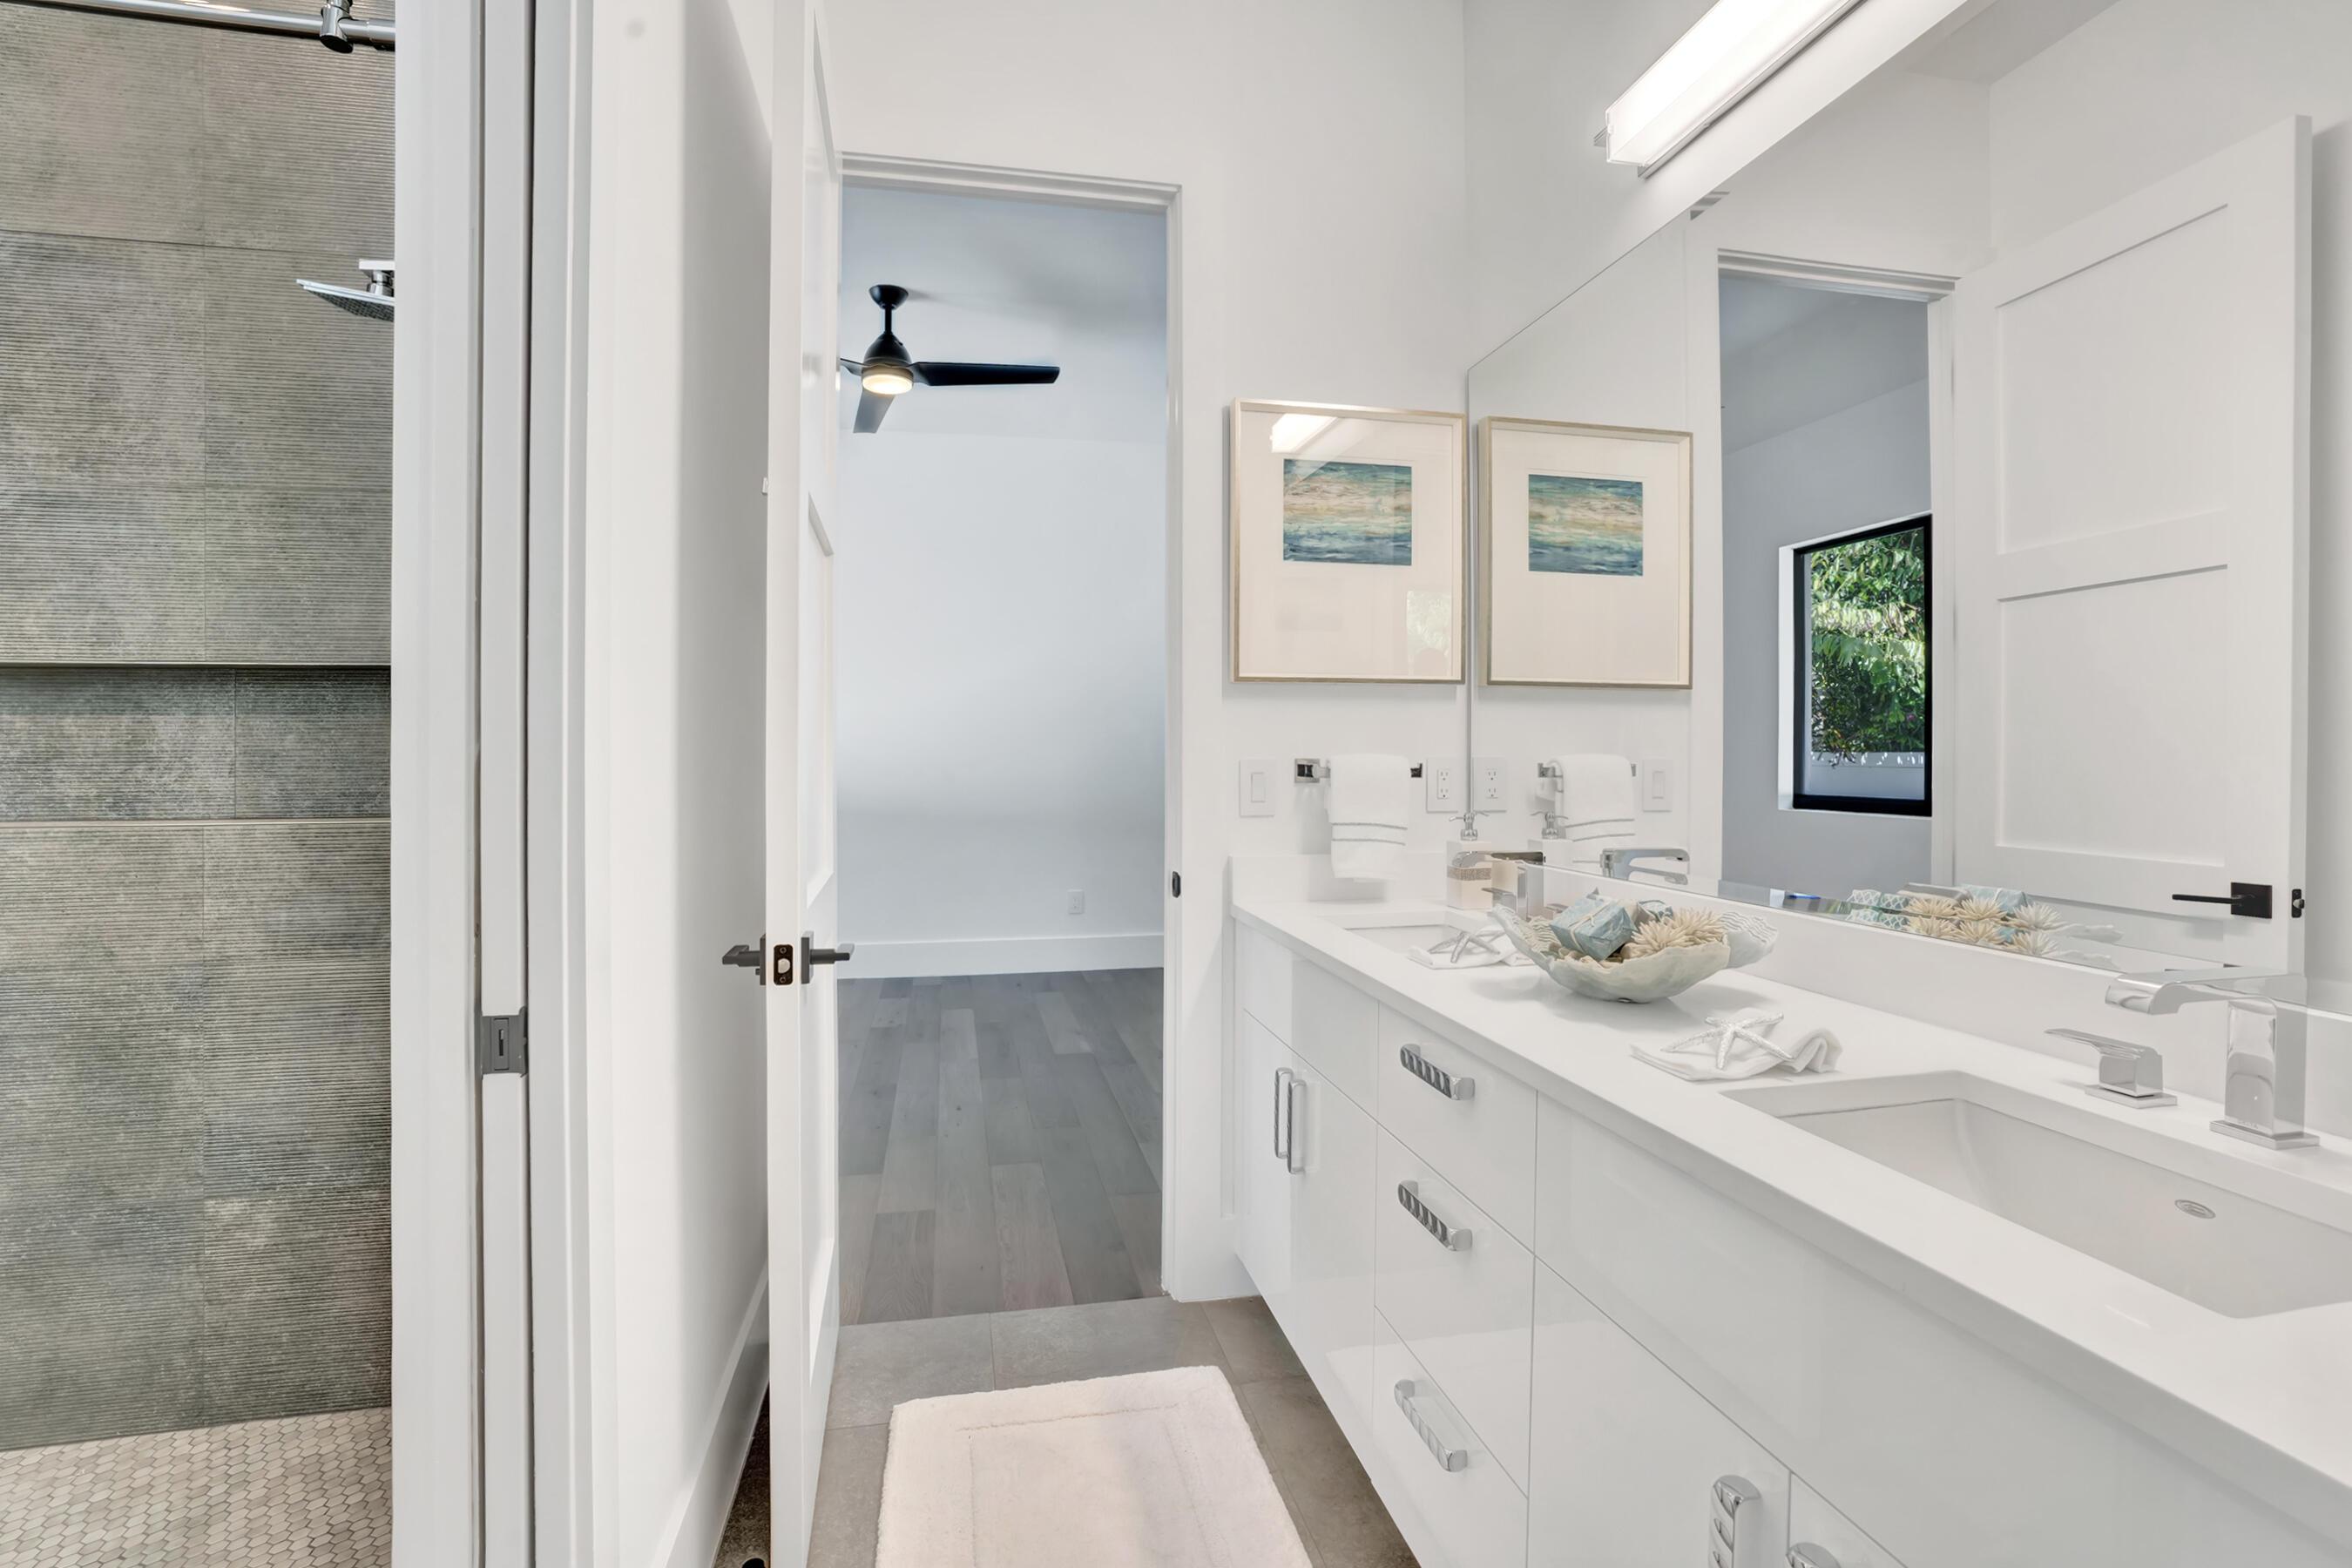 651 Kingsbridge Street, Boca Raton, Florida 33487, 4 Bedrooms Bedrooms, ,3 BathroomsBathrooms,Residential,For Sale,Kingsbridge,RX-10746270